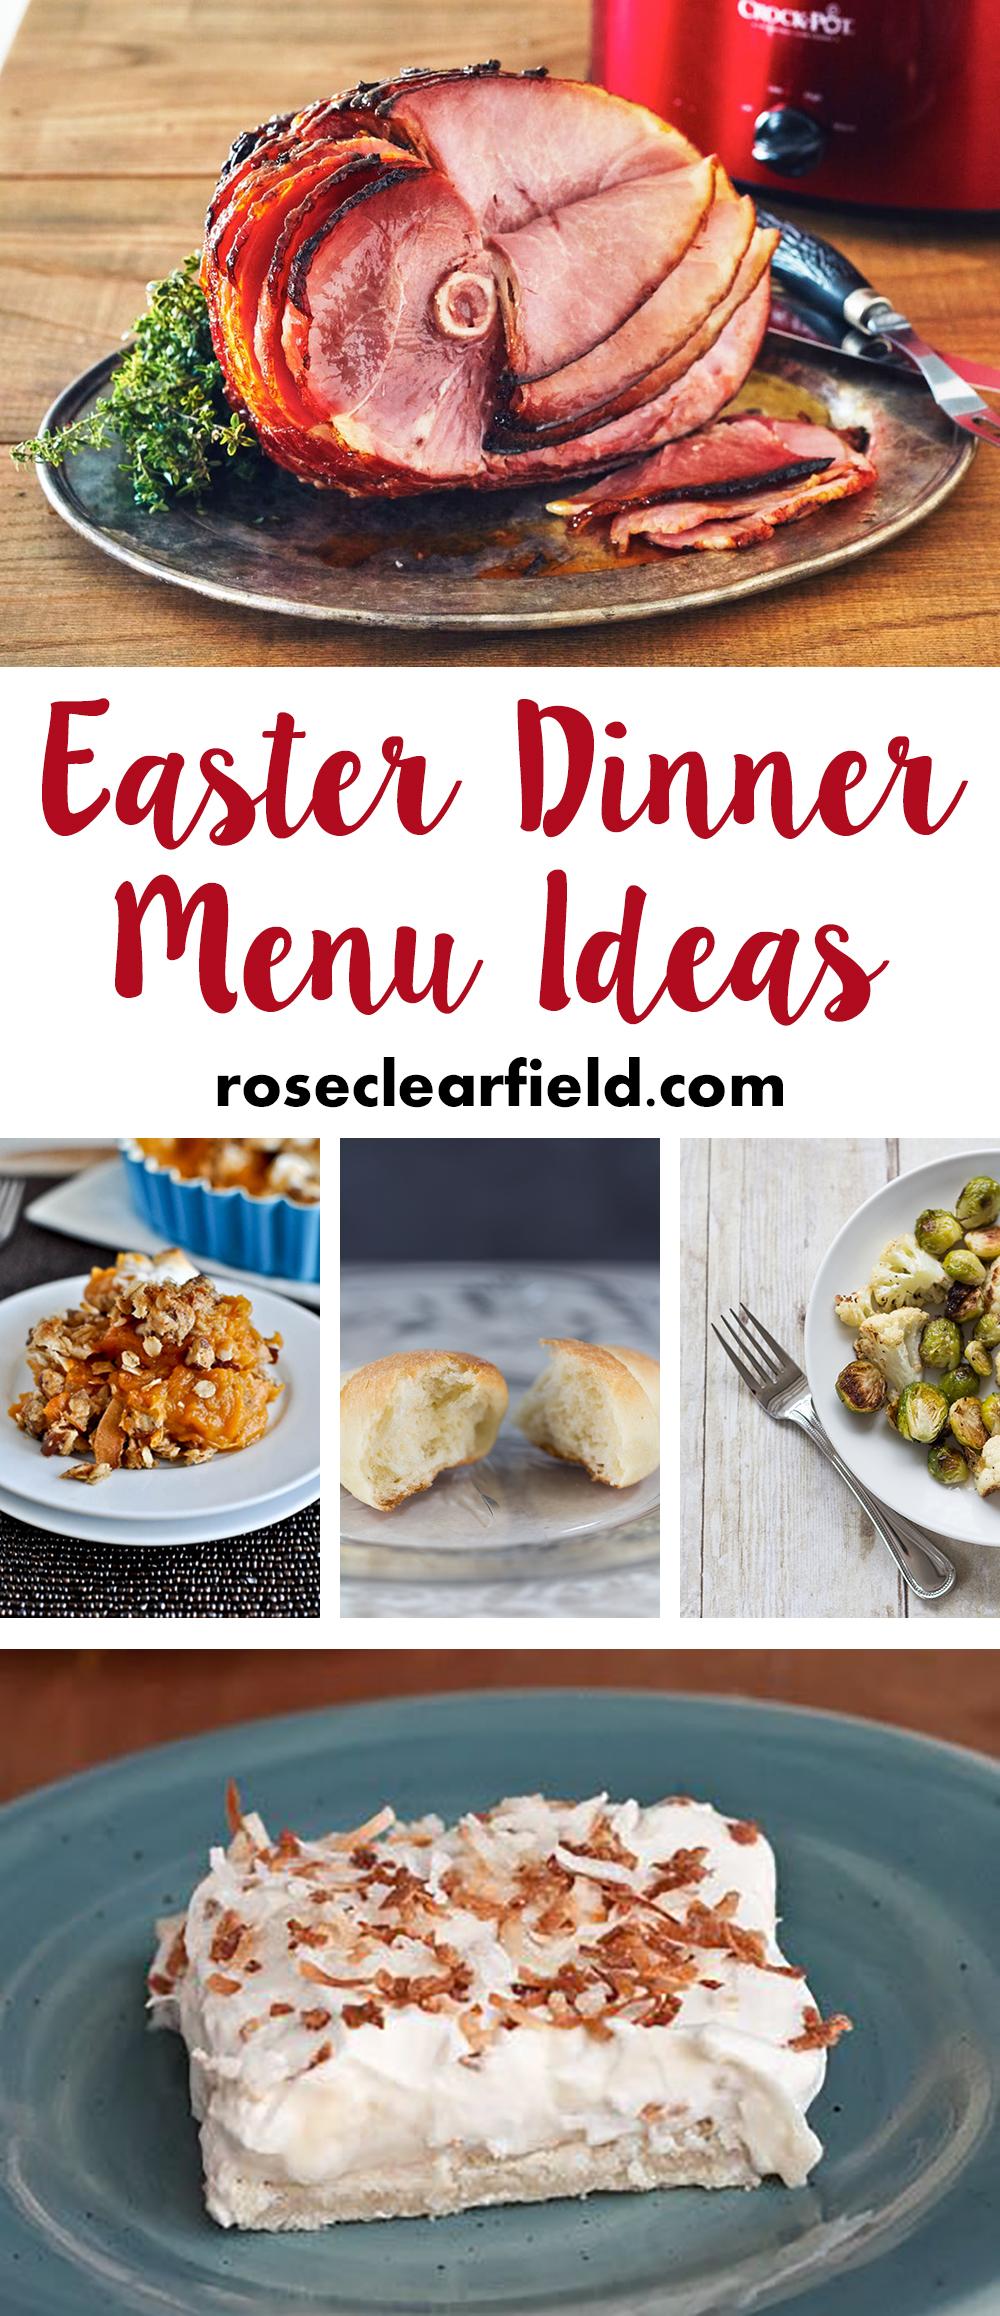 Easter Dinner Menu Ideas Rose Clearfield